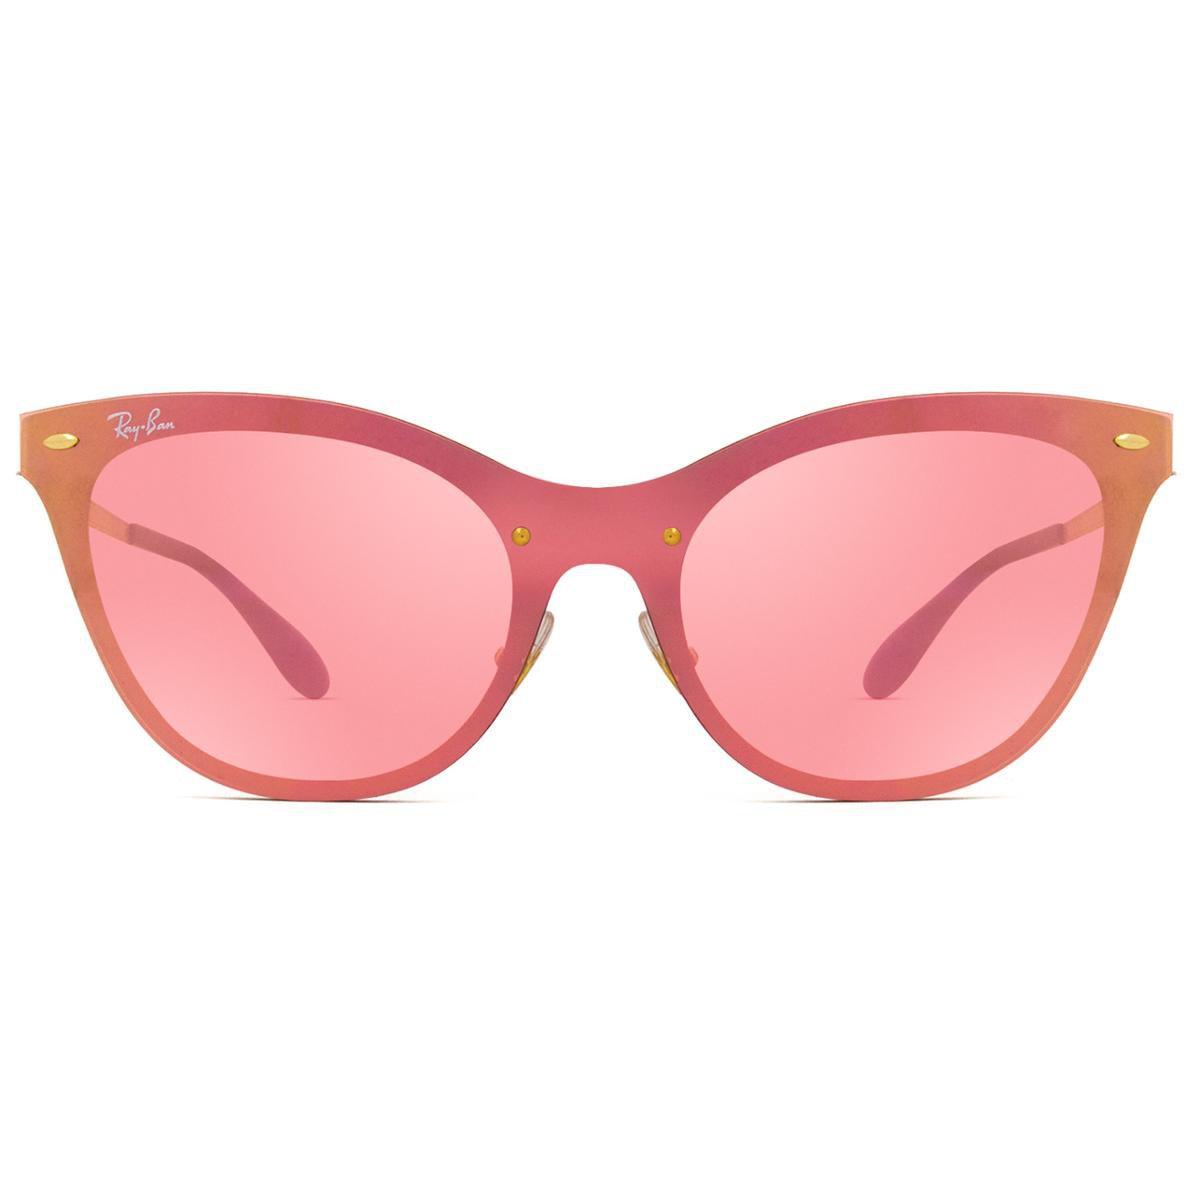 Óculos Ray Ban Blaze Cat Eye - Compre Agora   Zattini 9fb810d1b8